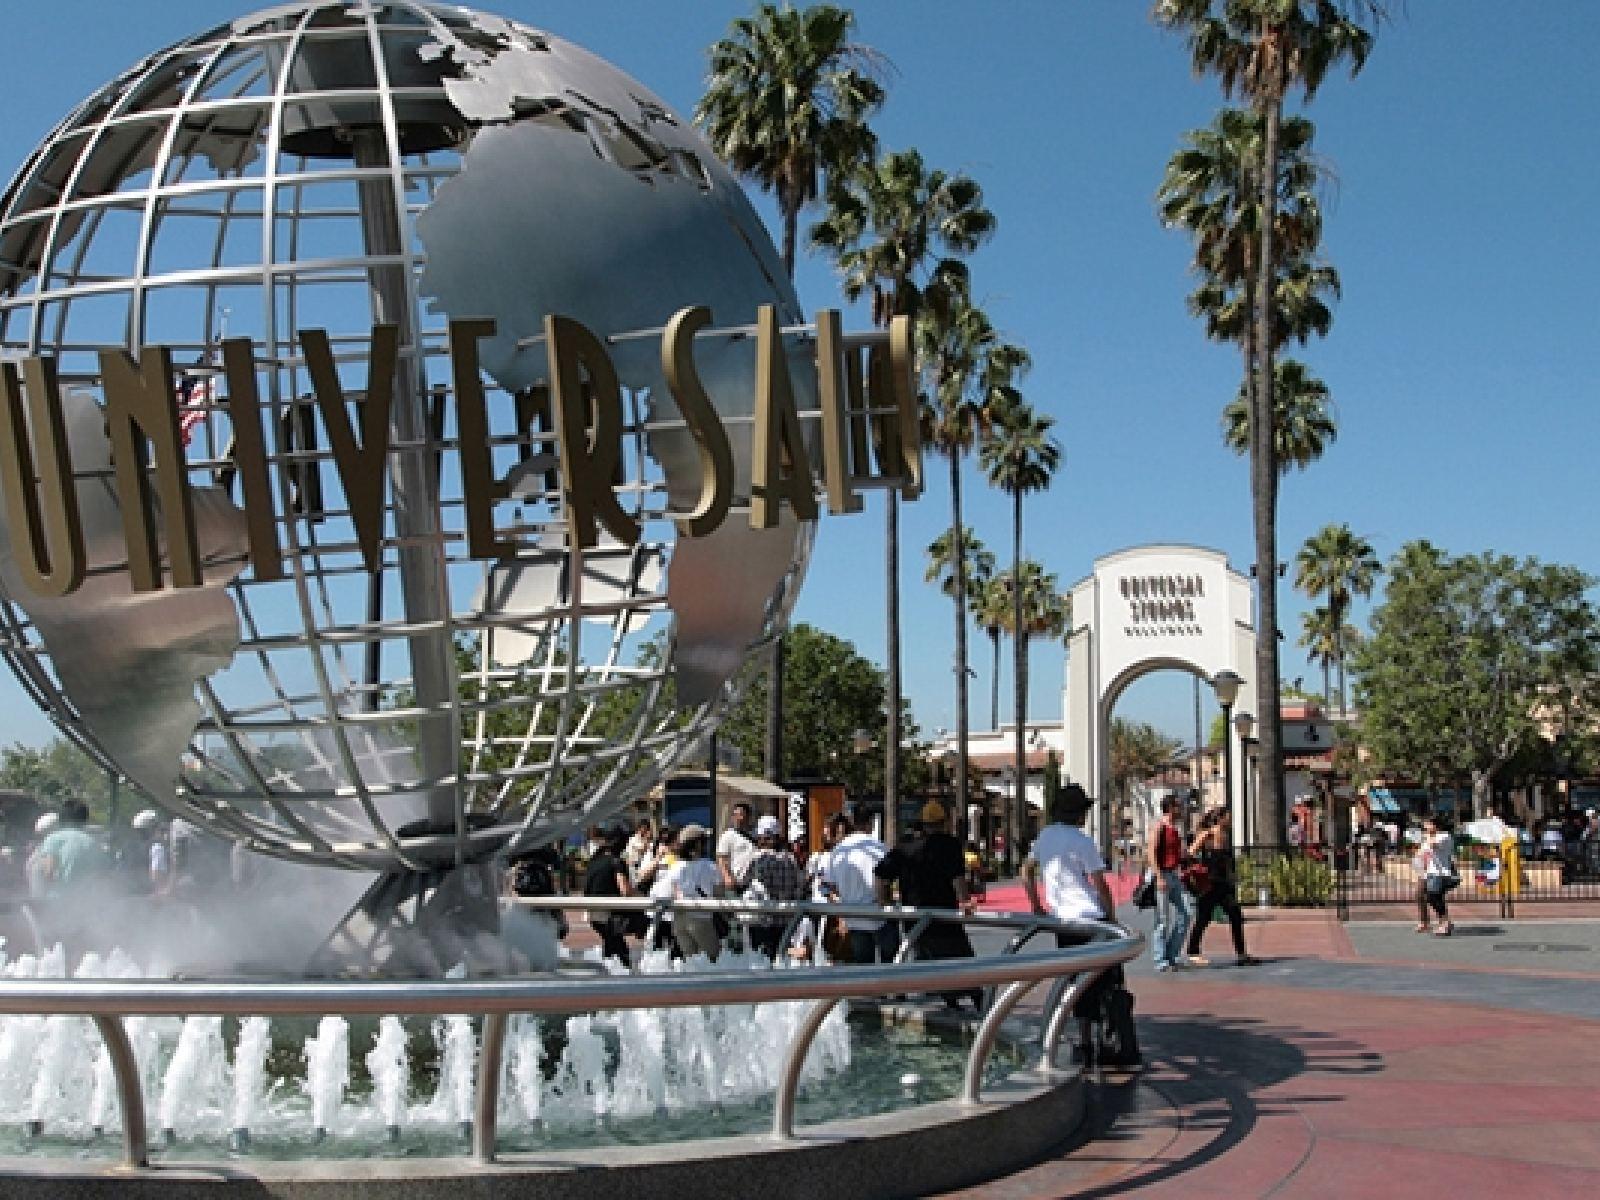 Main image for article titled Die 10 unverzichtbaren Highlights der Universal Studios Hollywood